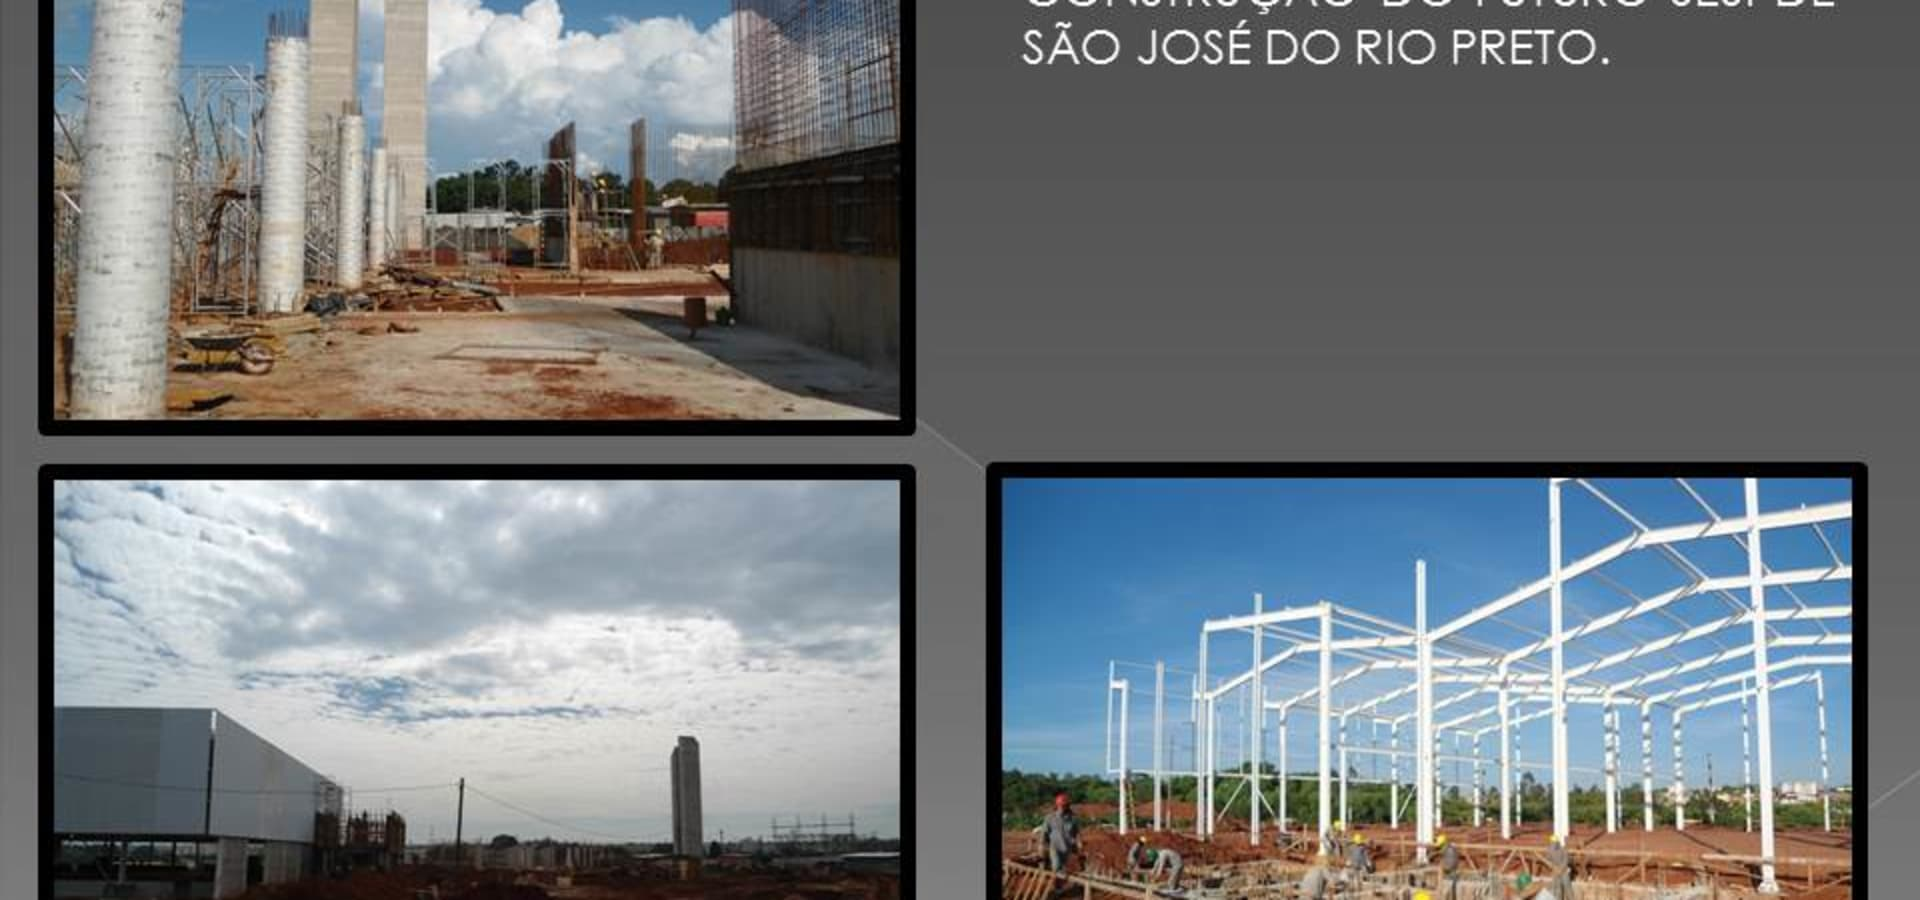 Adrieli Santos Arquiteura